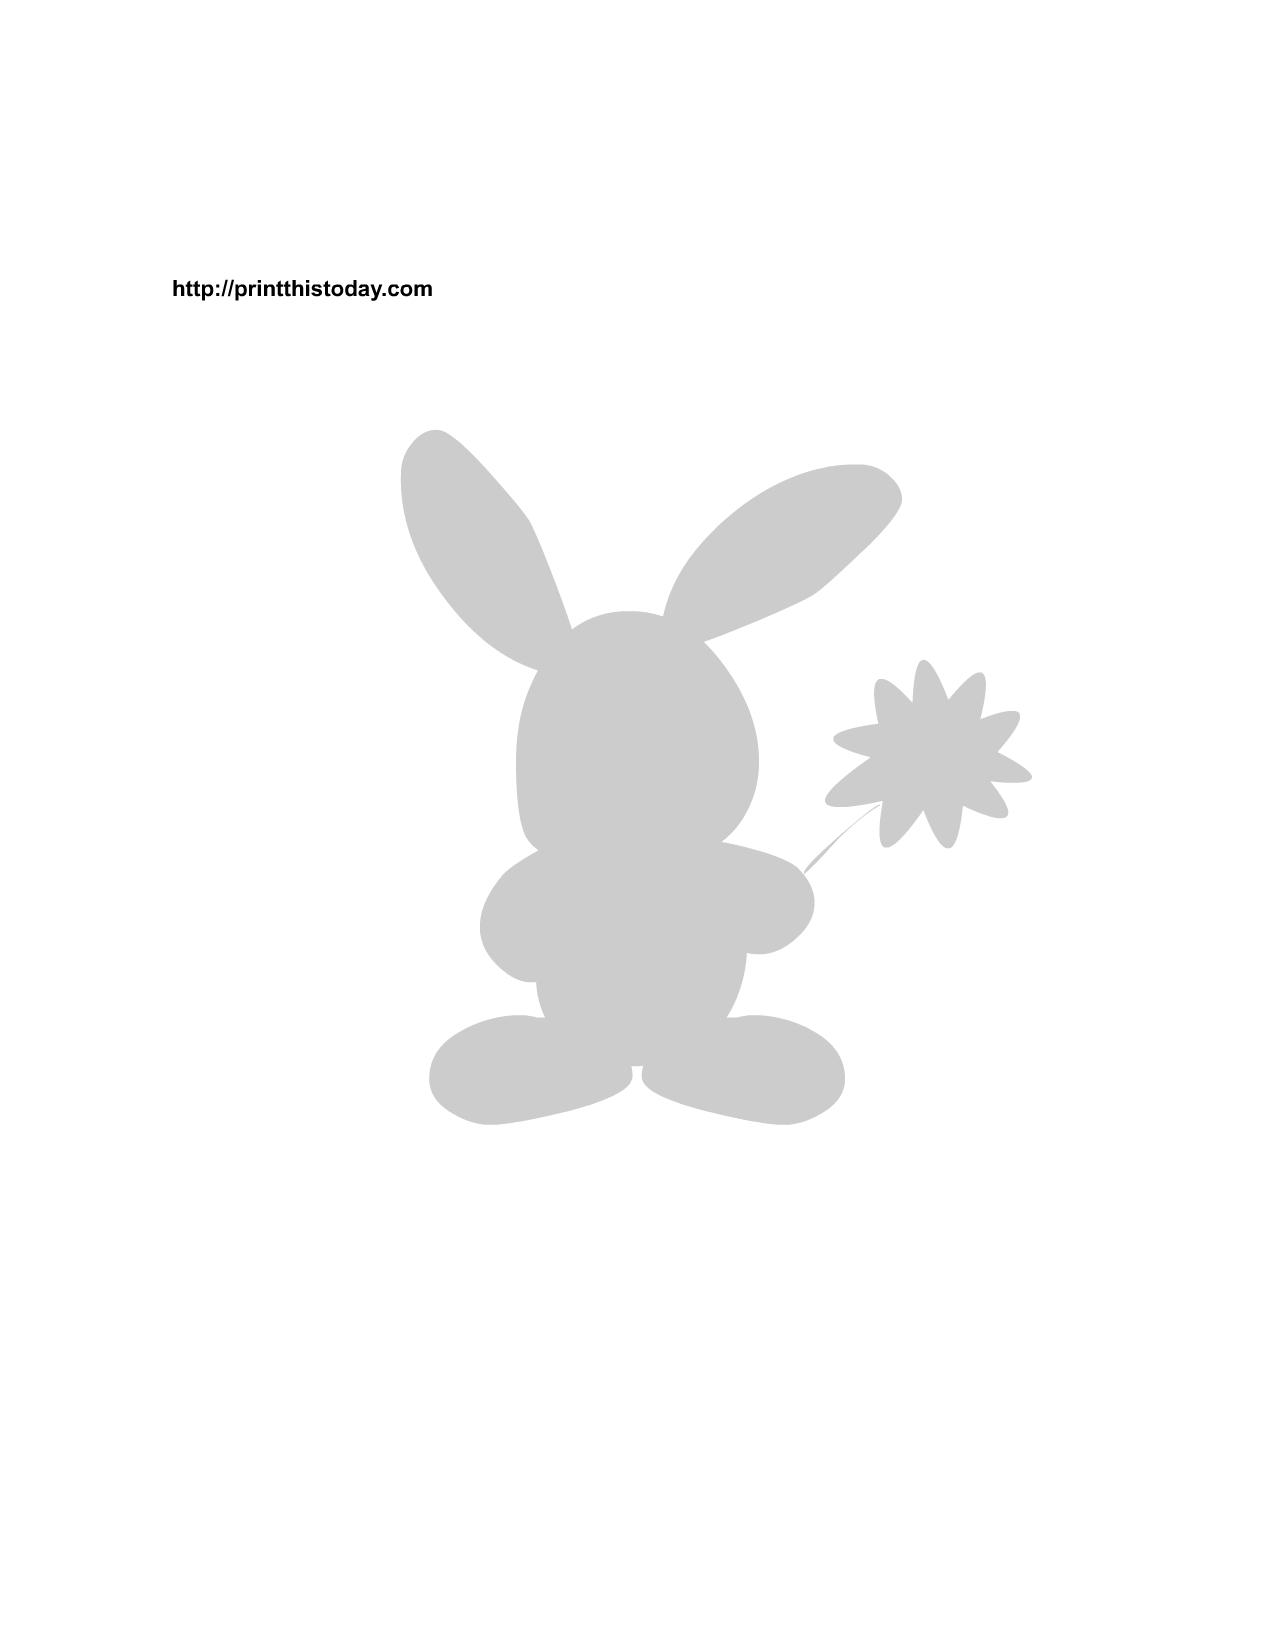 Free Printable Bunny Stencils - Free Printable Bunny Pictures